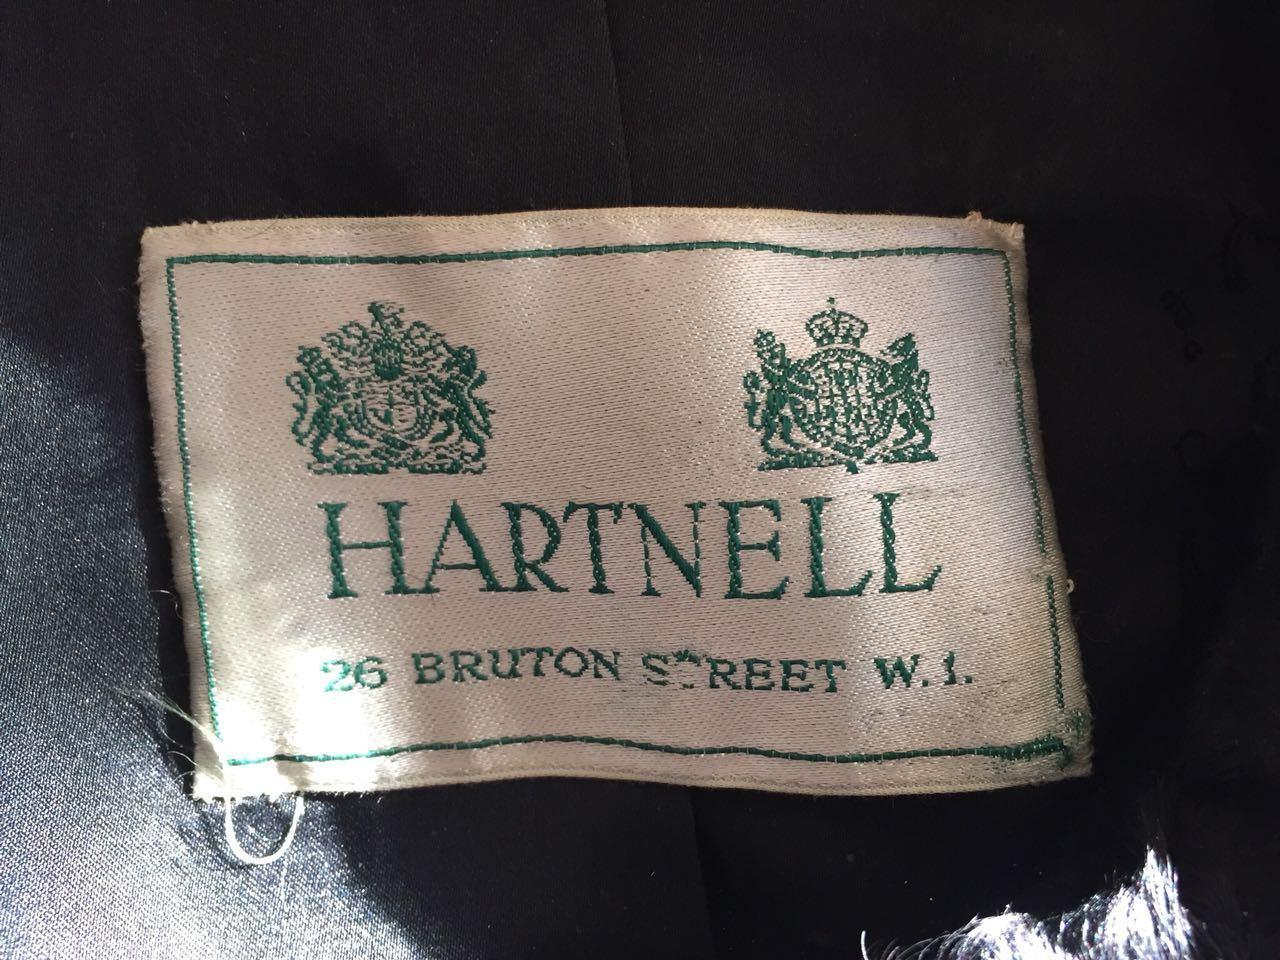 Hartnell designer coat/fur SZ SMALL MEDIUM - image 3